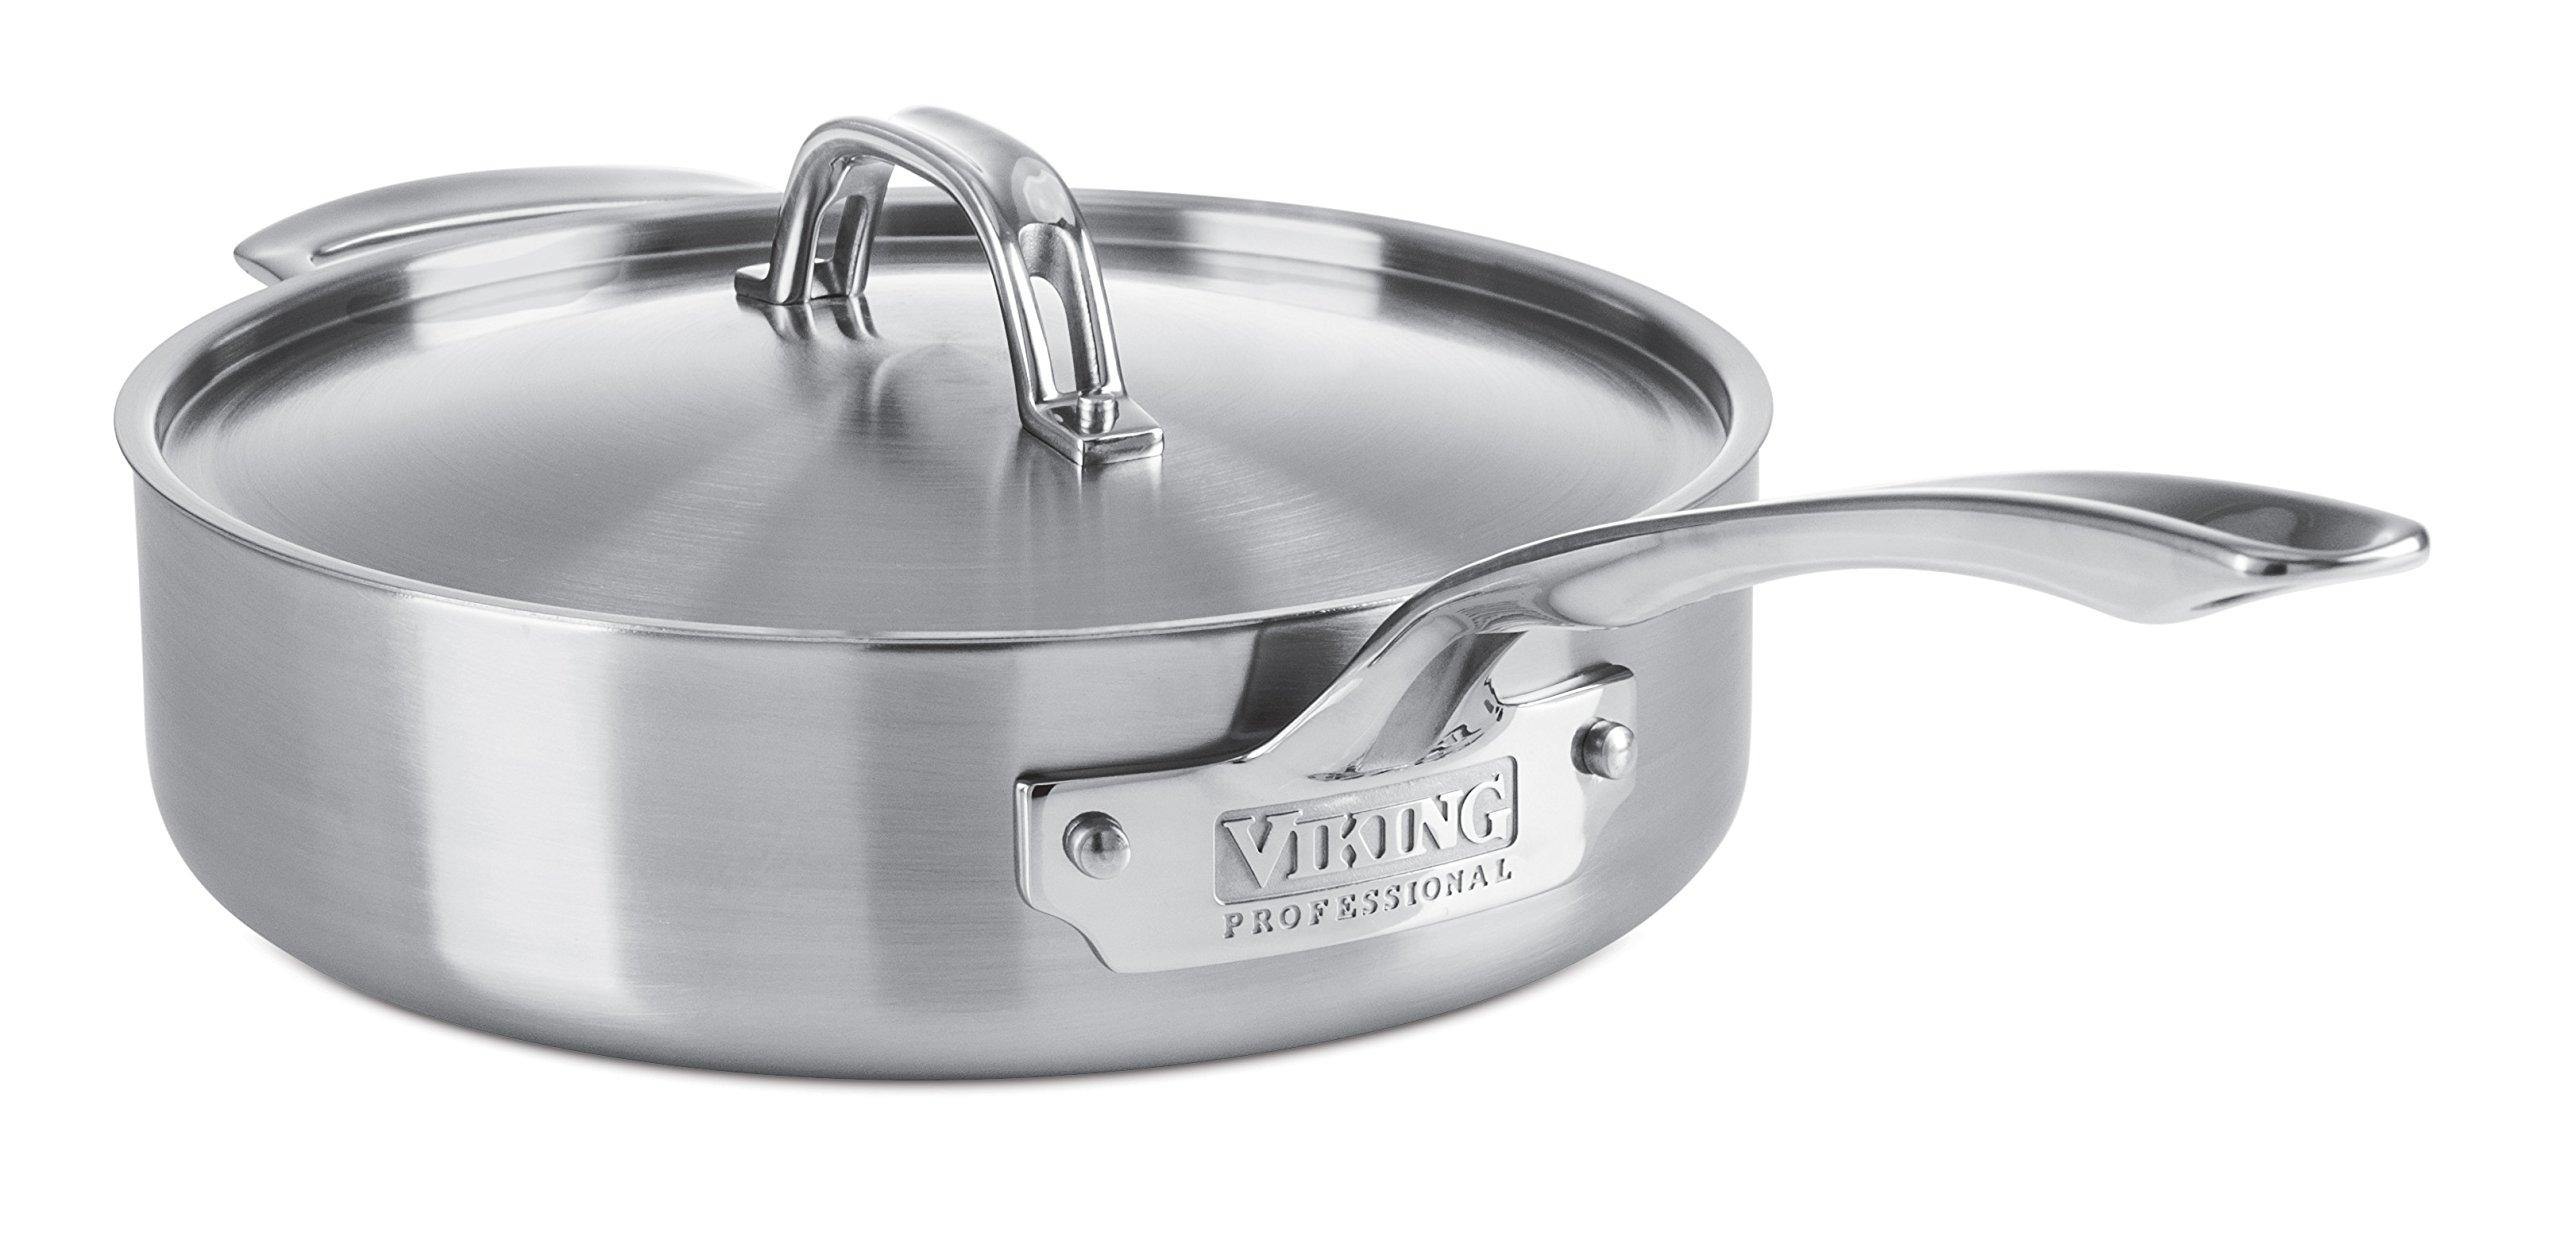 Viking Professional 5-Ply Stainless Steel Sauté Pan, 3.4 Quart